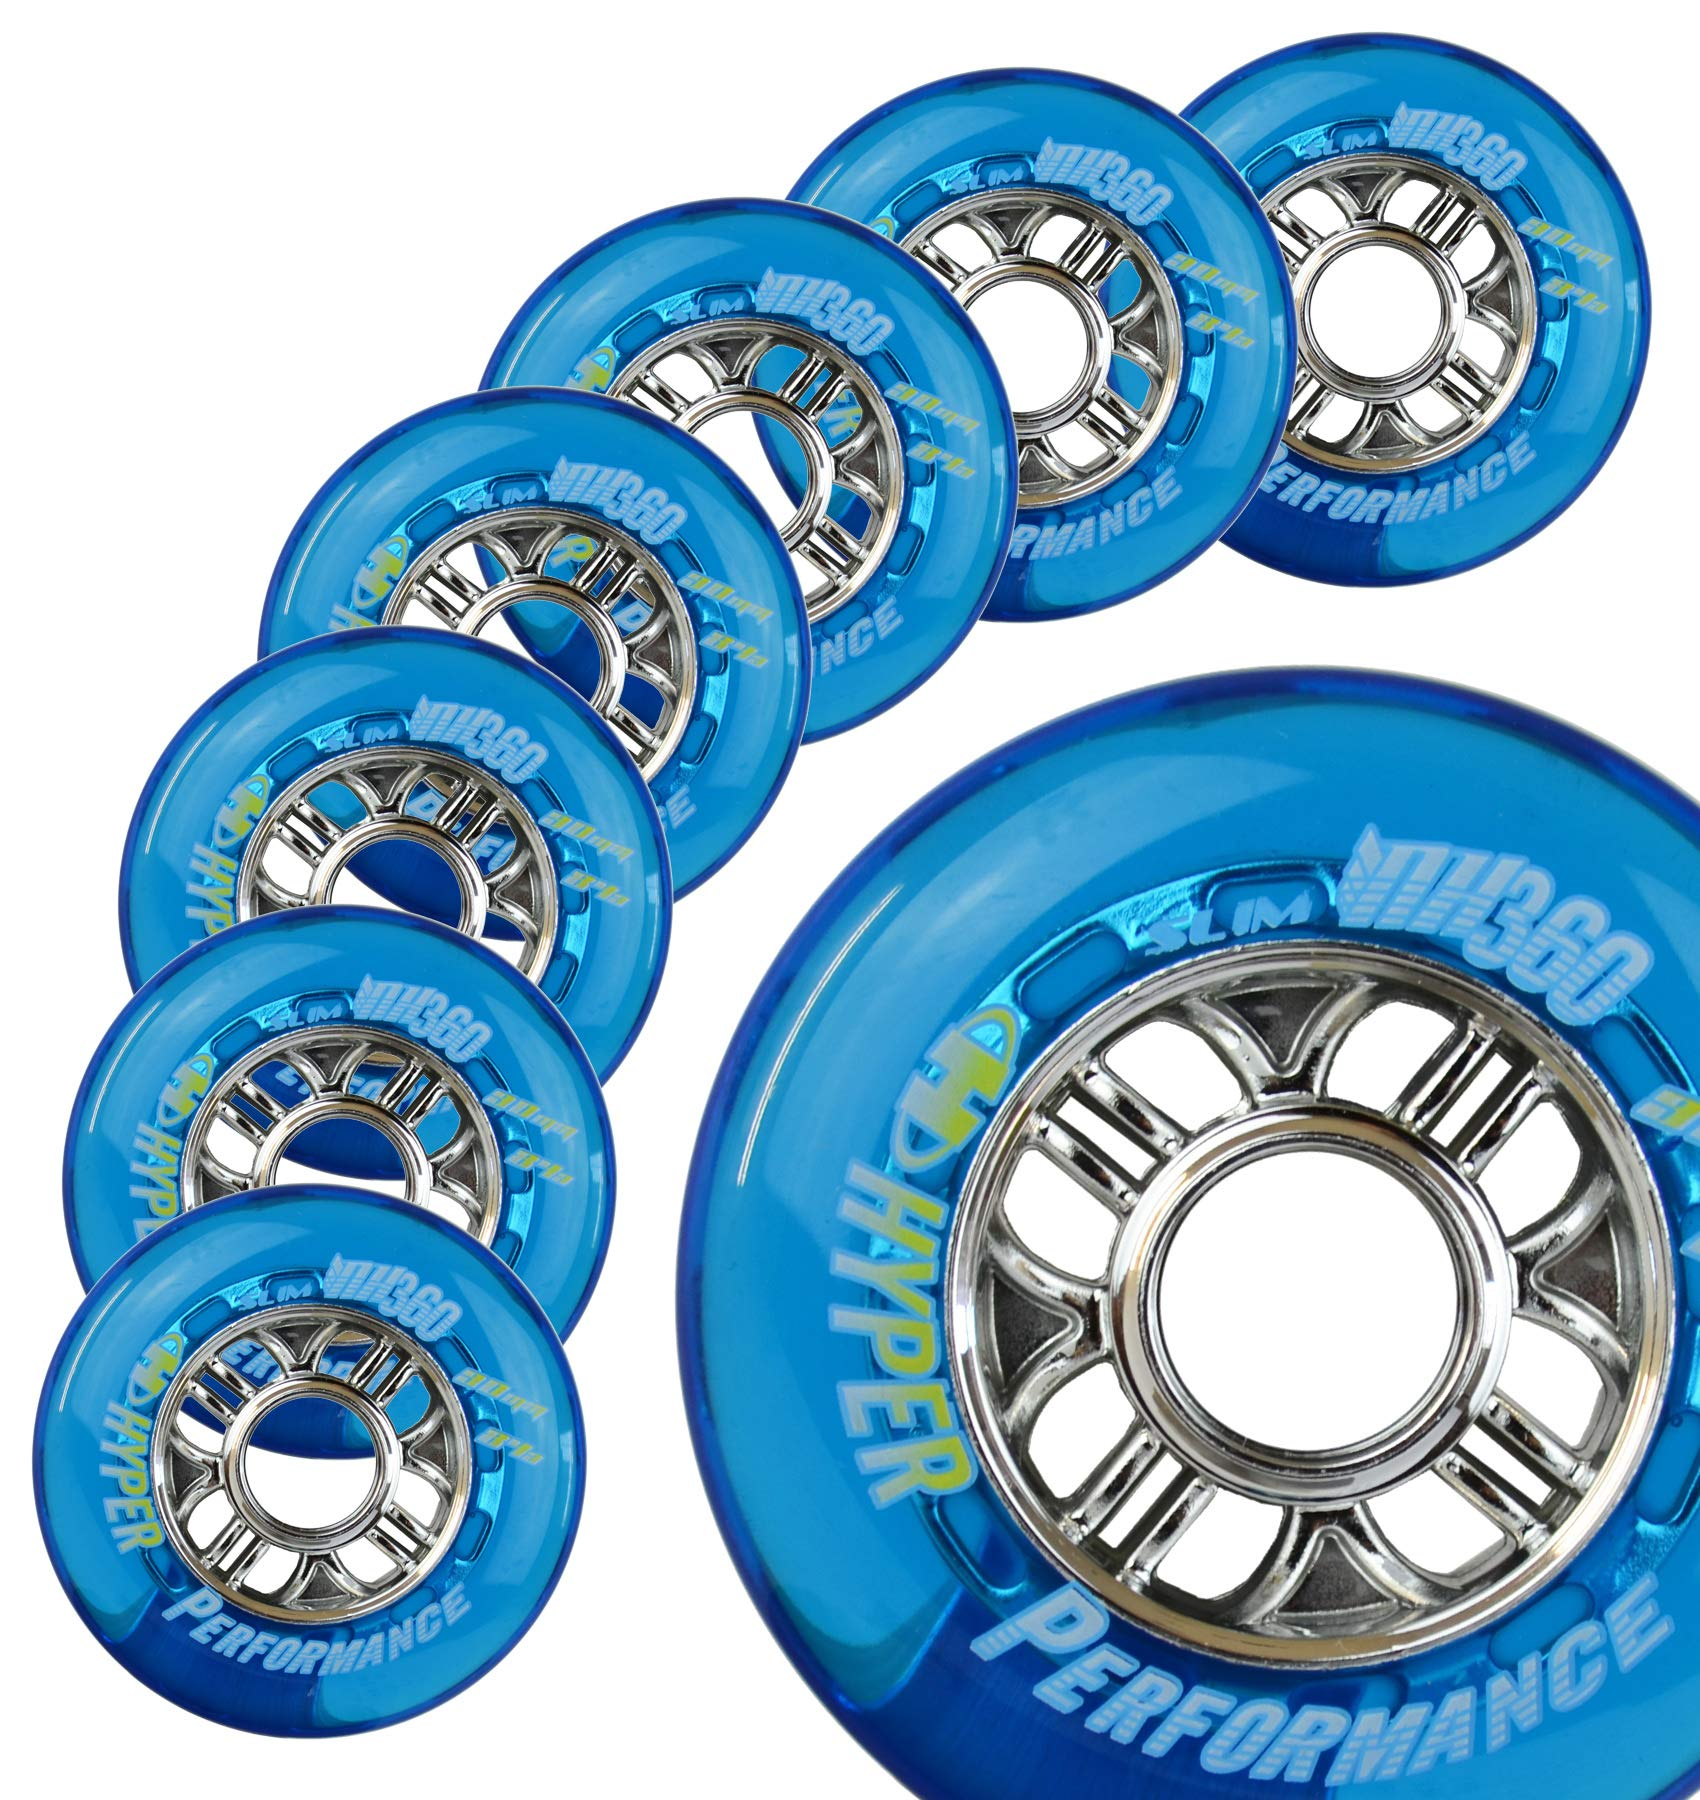 Hyper NX360 Blue - 8 Wheels - 84A - Fitness (Sizes: 80mm, 84mm, 90mm) (80 MM)